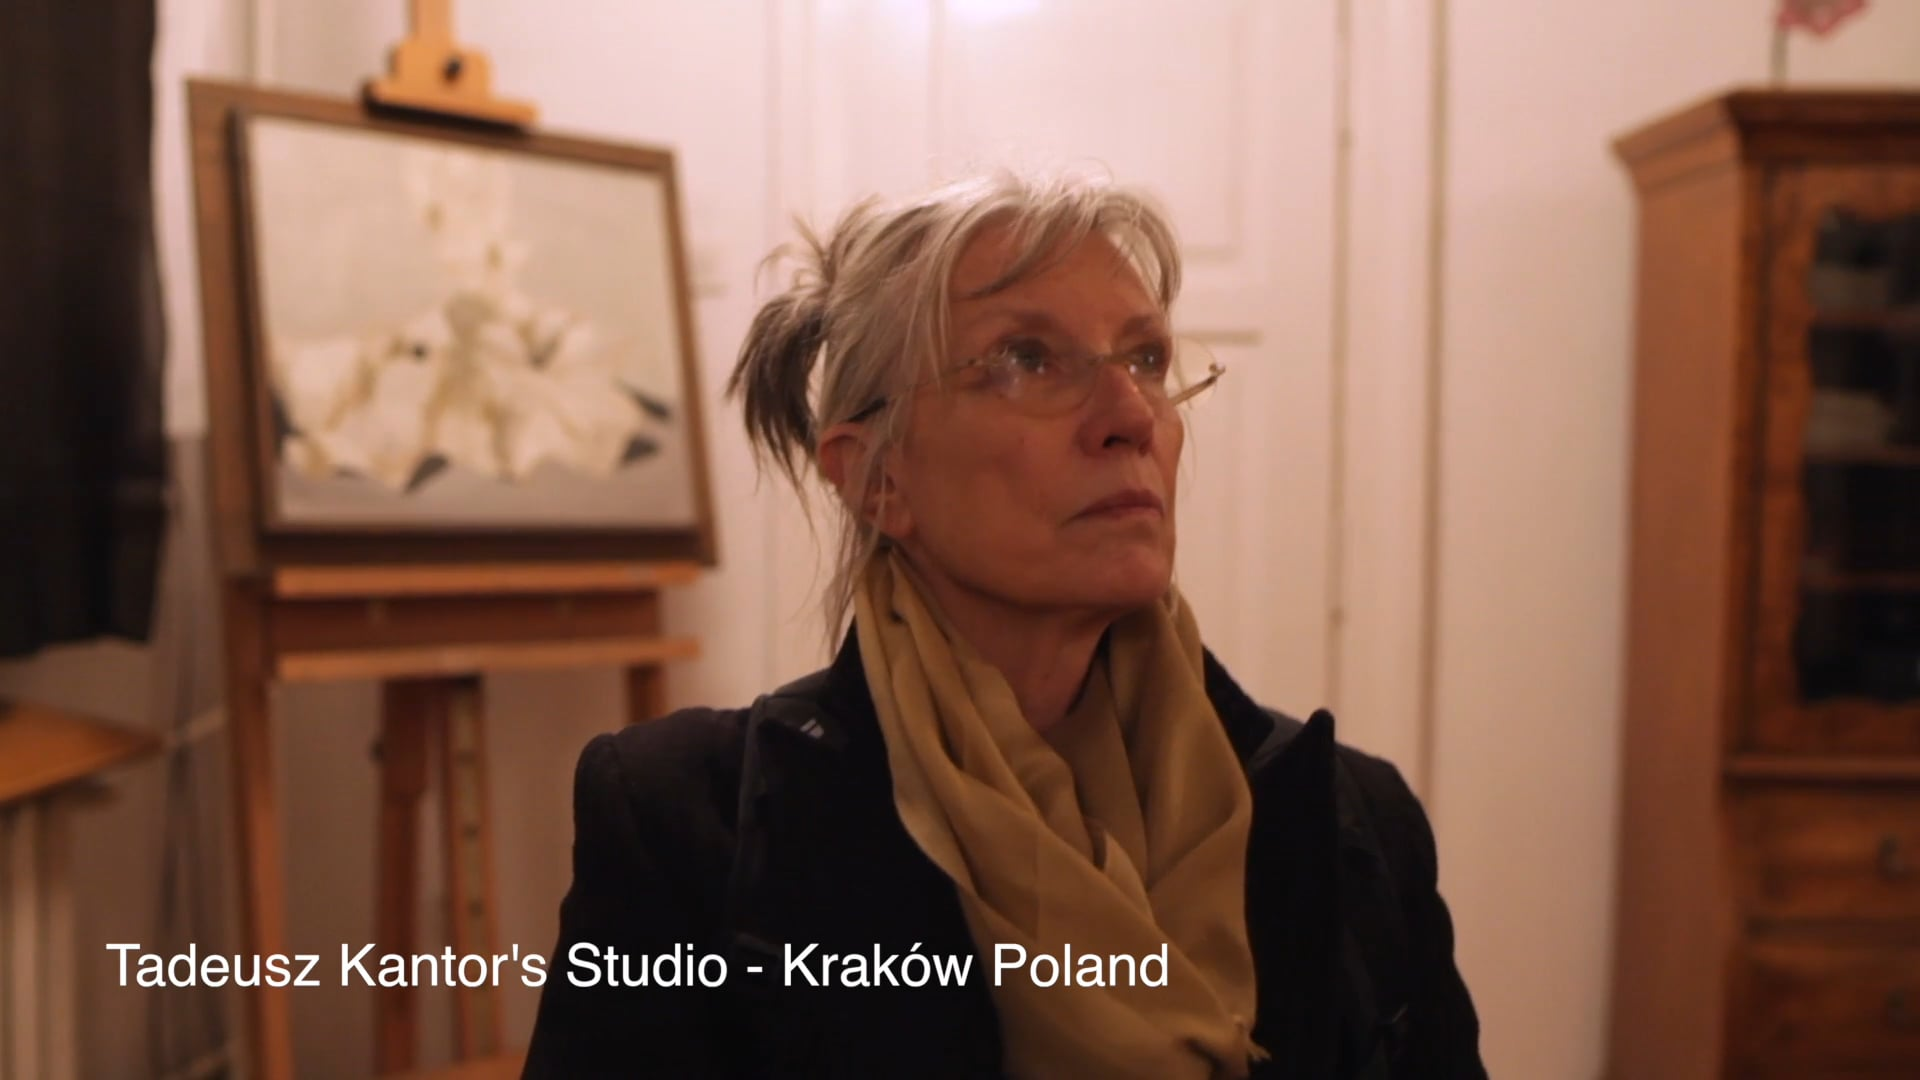 A PINK CHAIR — Liz LeCompte in Tadeusz Kantor's studio in Krakow (2013) [03.23.18]